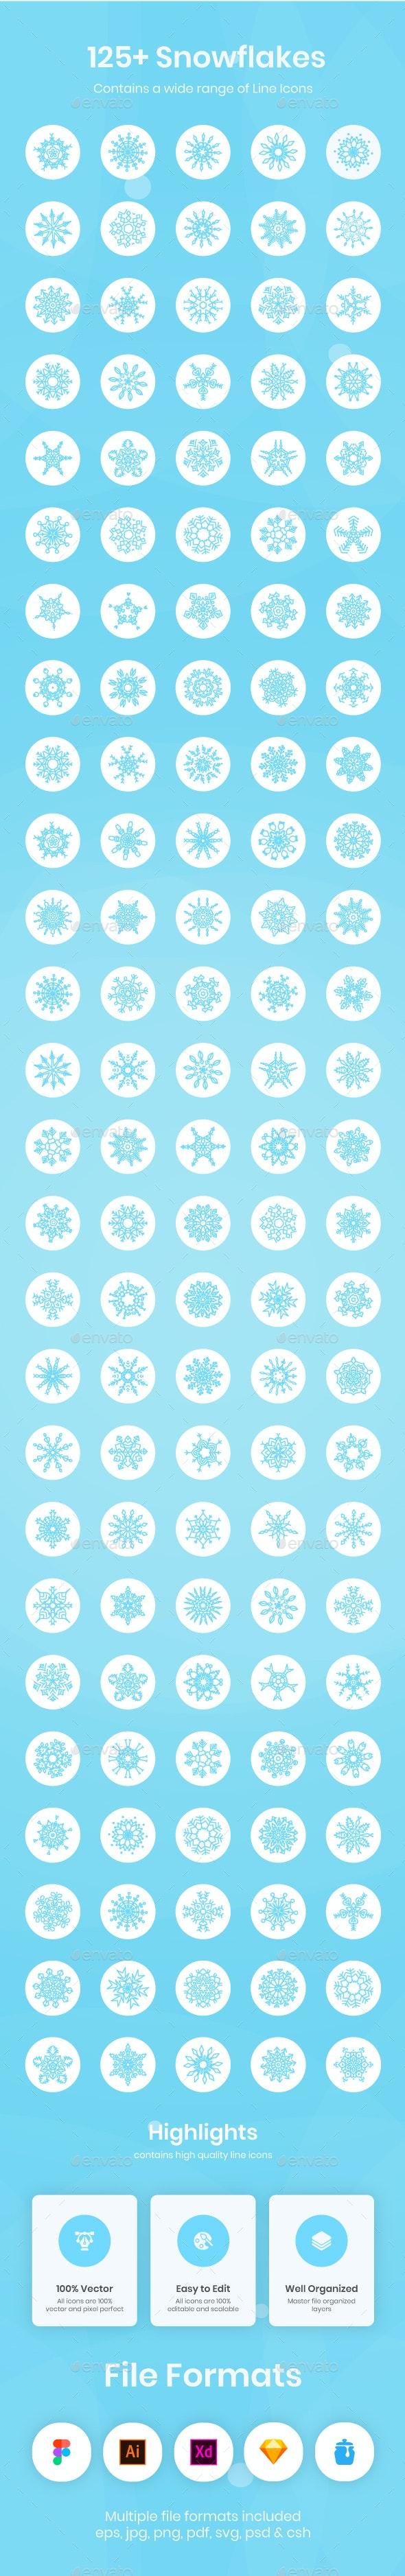 125+ Snowflakes Icons - Seasonal Icons